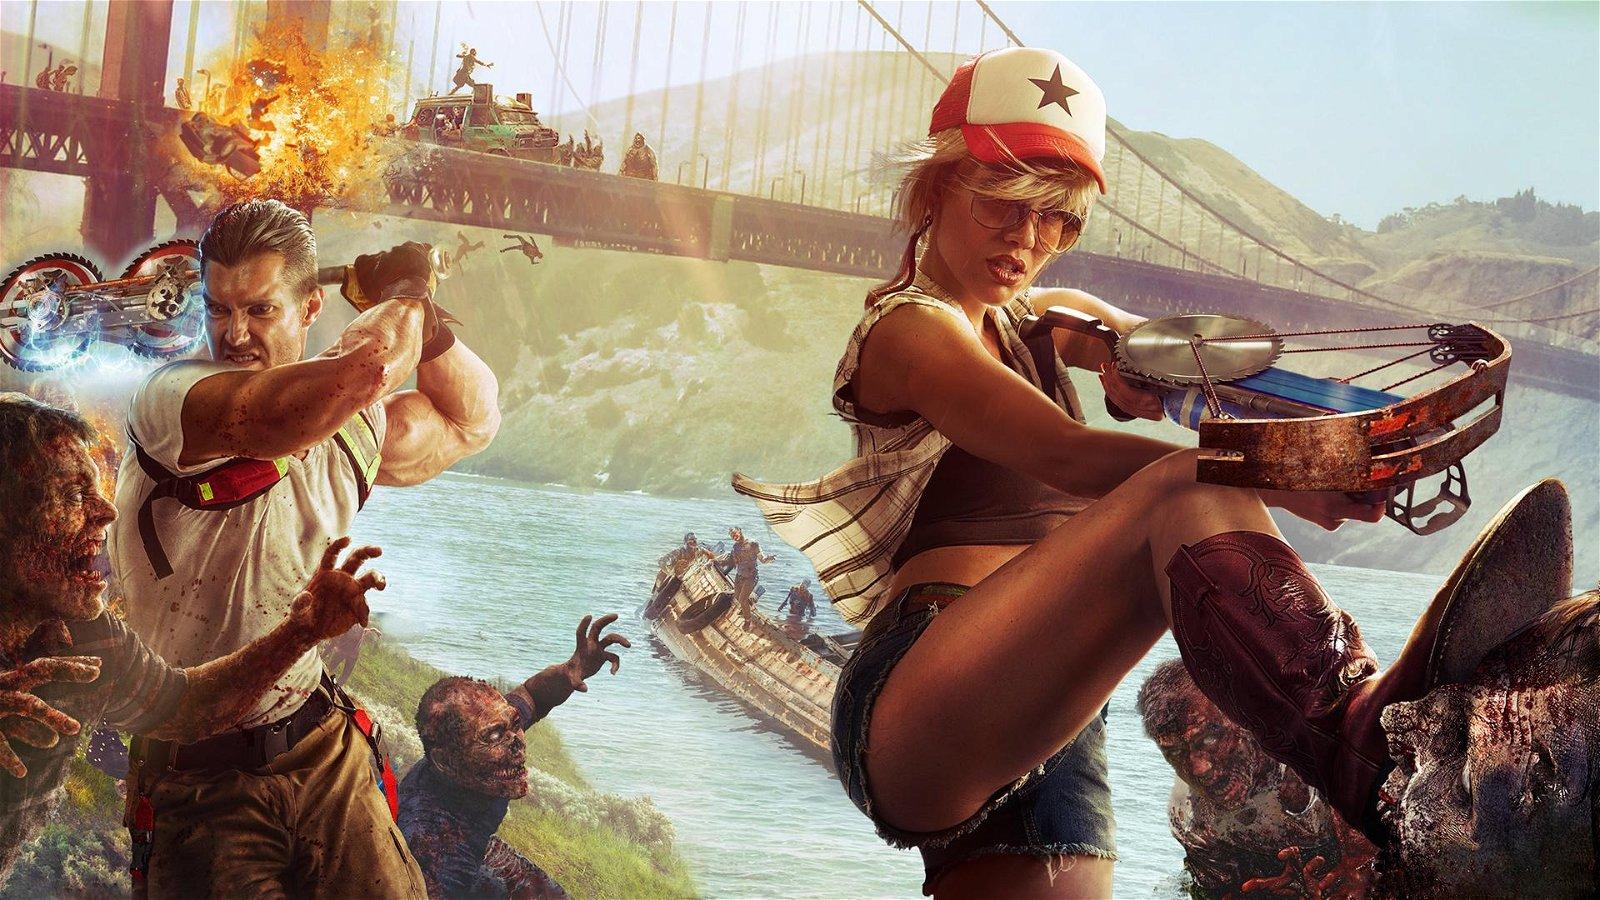 Sumo Digital Takes Over Development of Dead Island 2